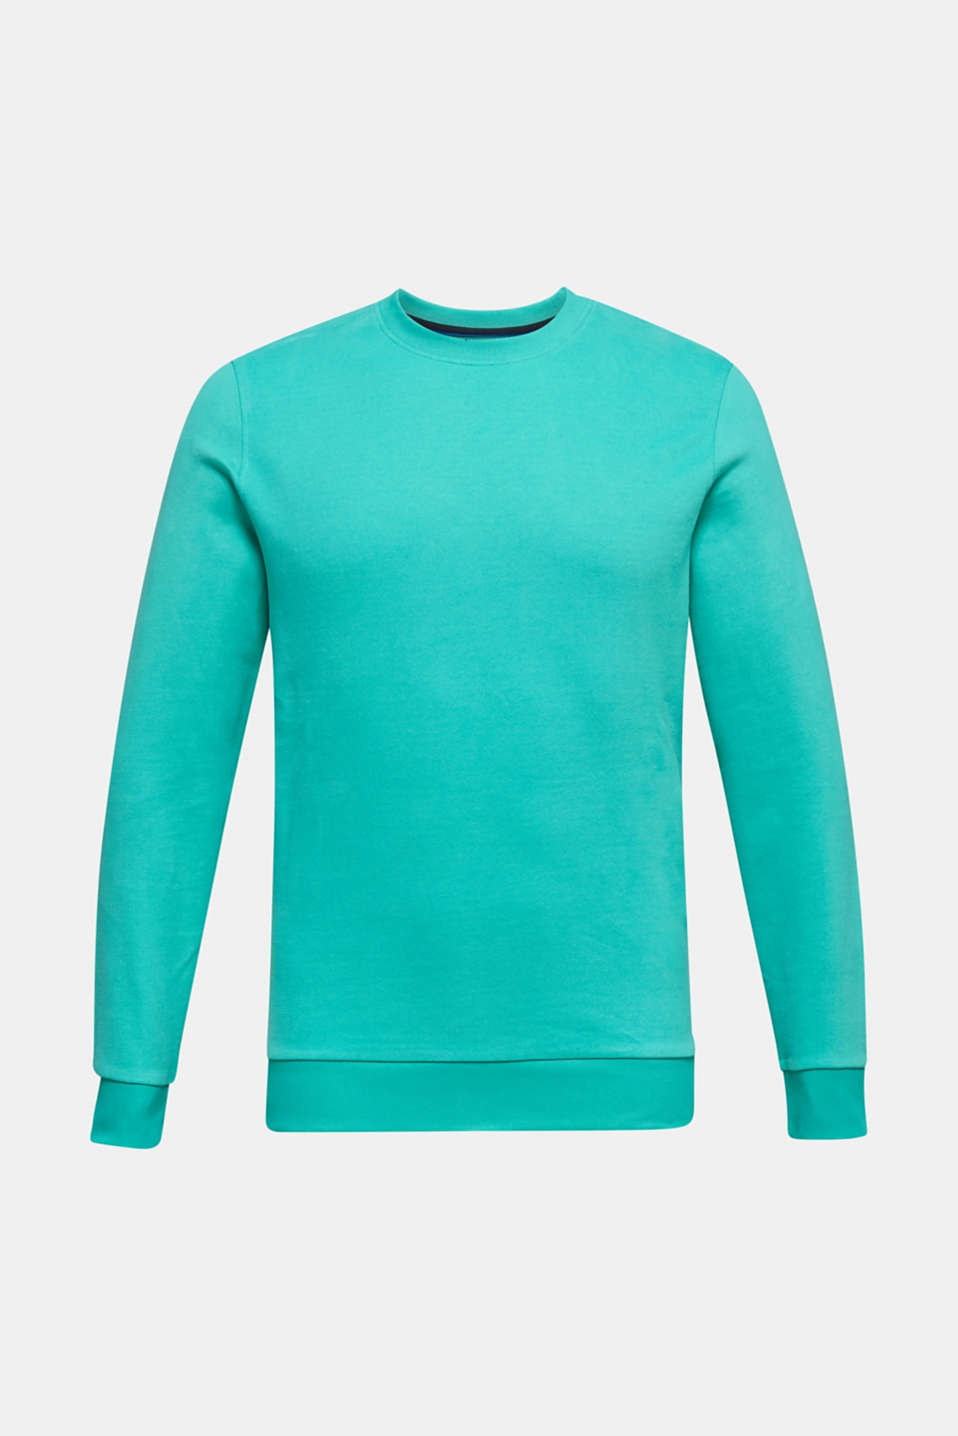 Sweatshirt in 100% cotton, AQUA GREEN 2, detail image number 6